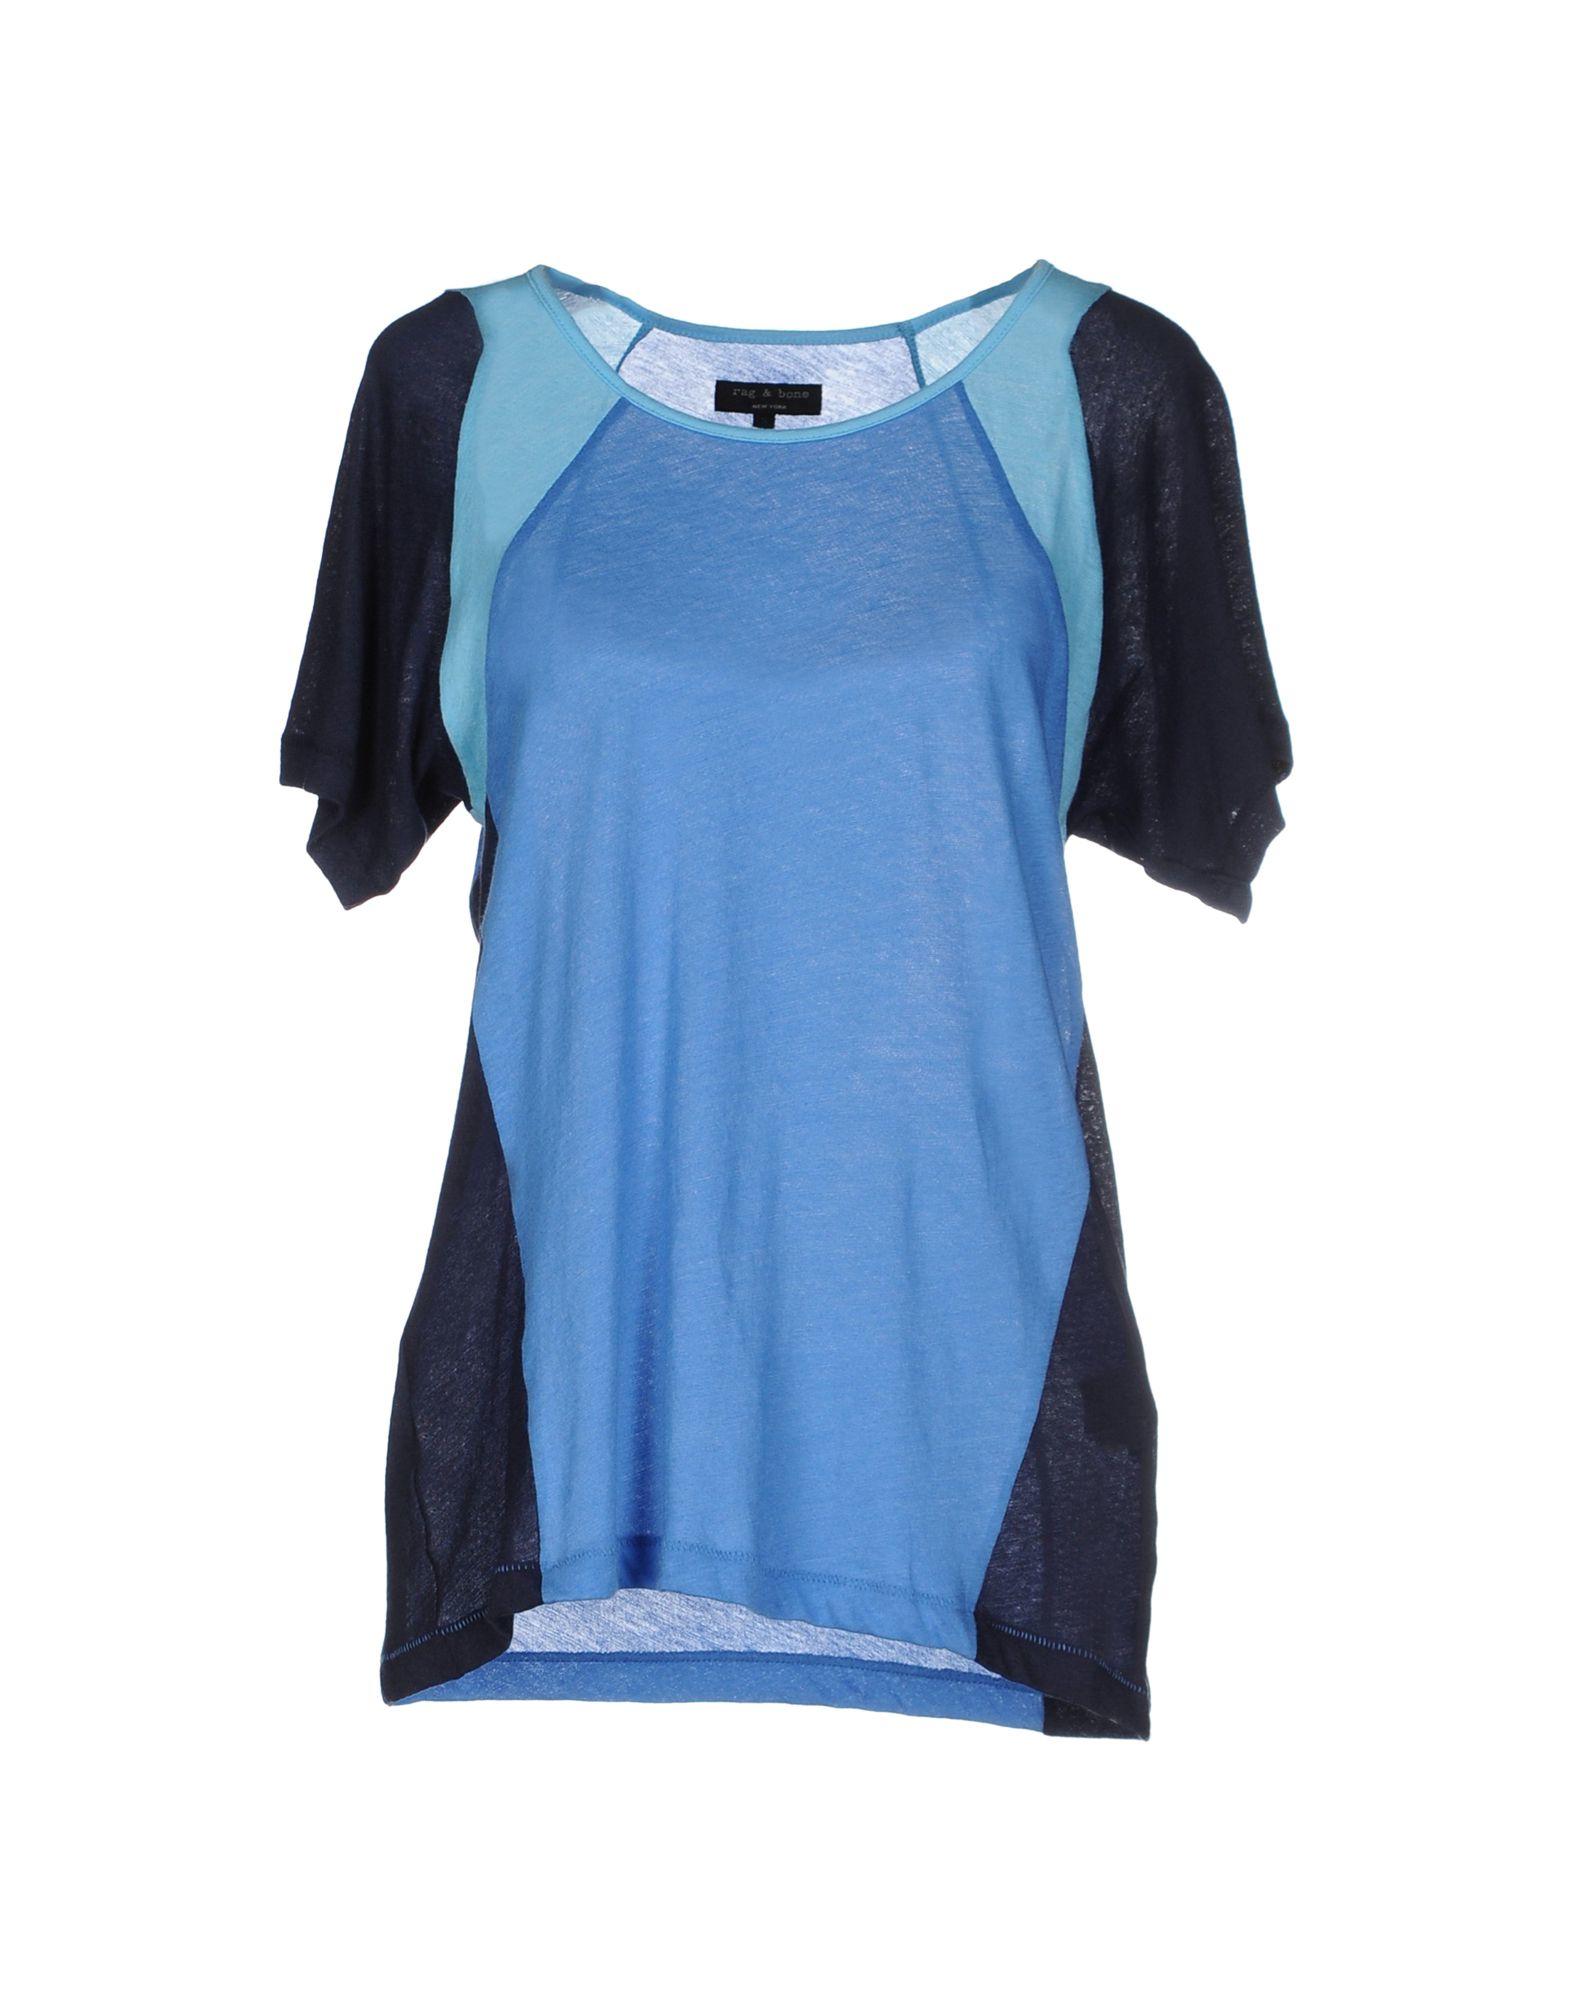 Rag bone t shirt in blue lyst for Rag and bone t shirts